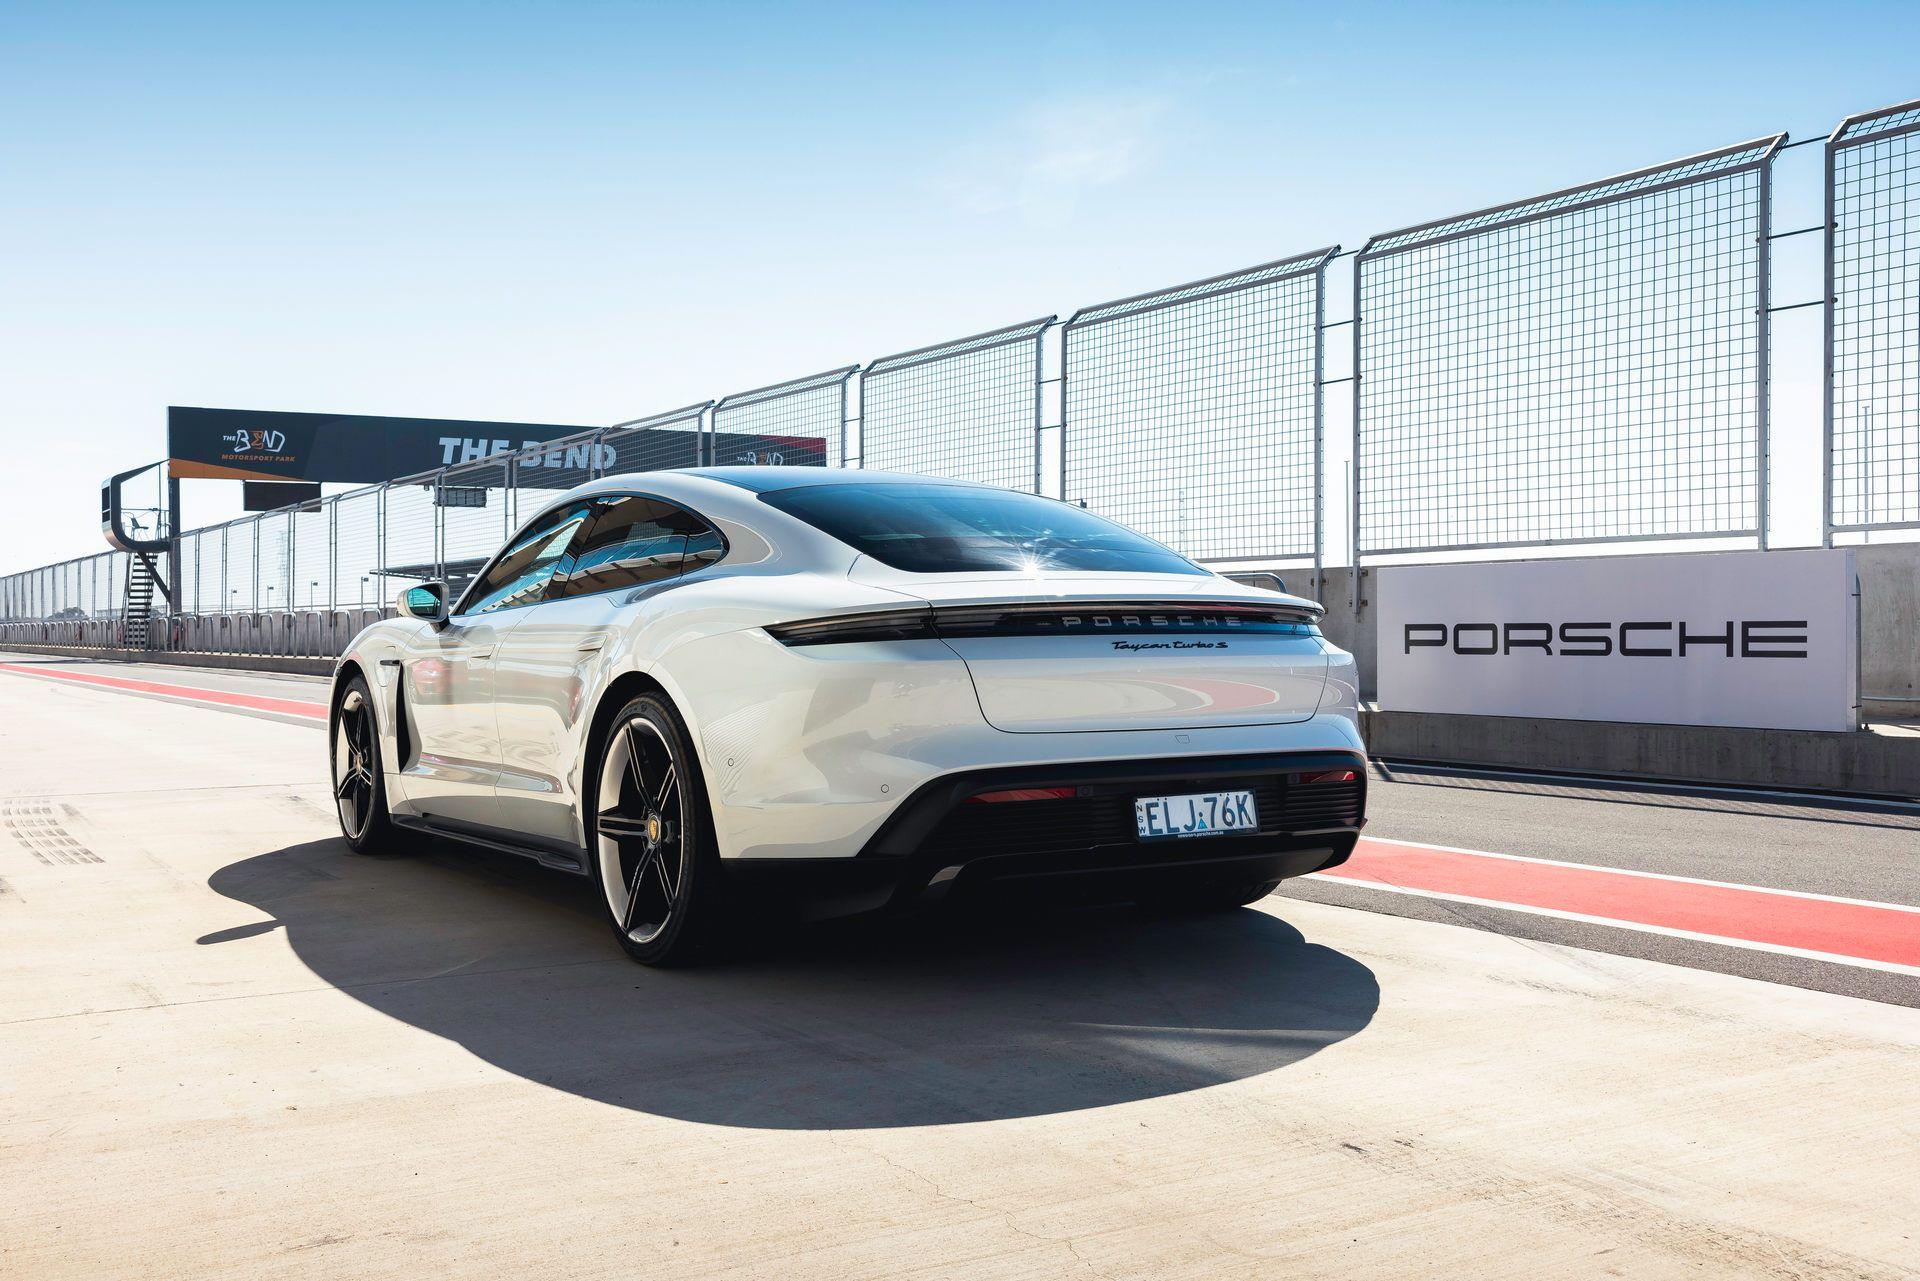 Porsche-Taycan-Turbo-S-The-Bend-Motorsport-Park-37